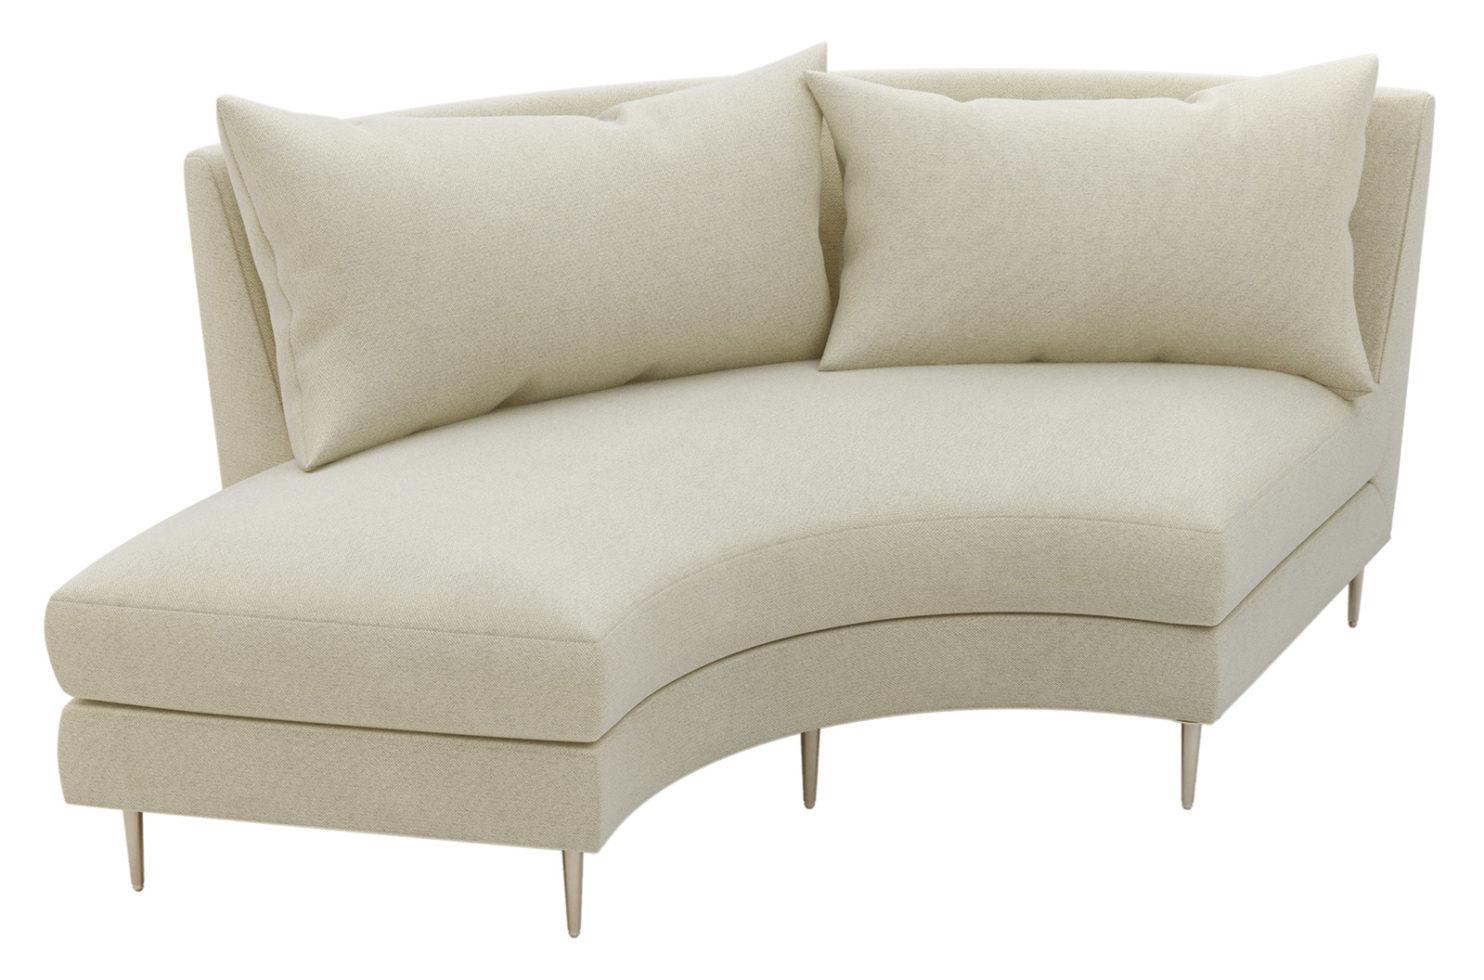 fizz mimosa armless sofa w bumper 105FT003P2 AS LSB